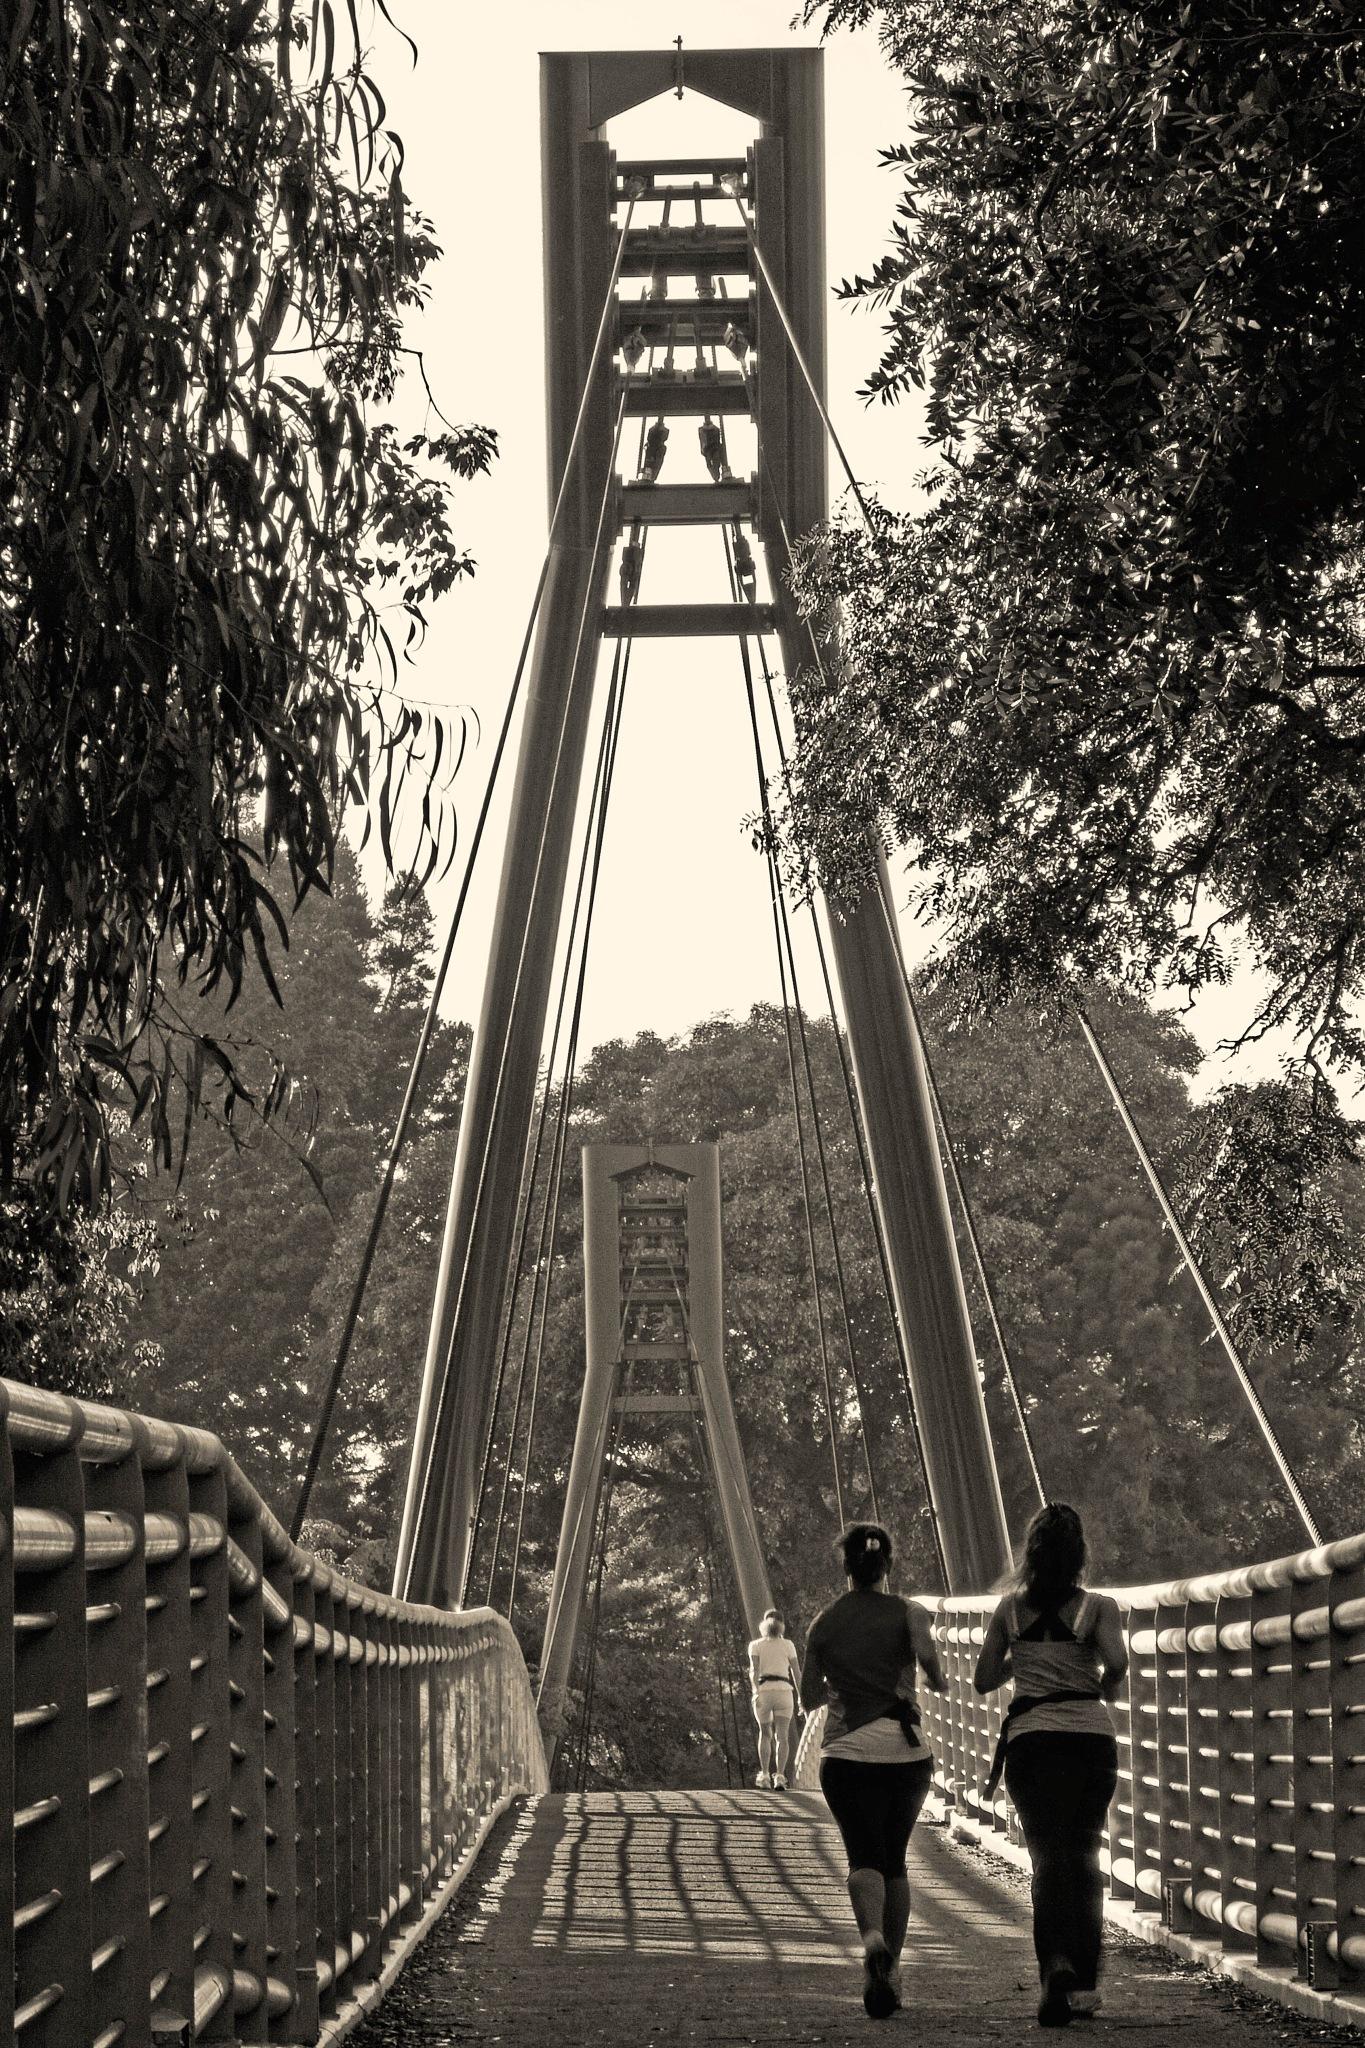 Runners on the bridge by Alberto Figueroa